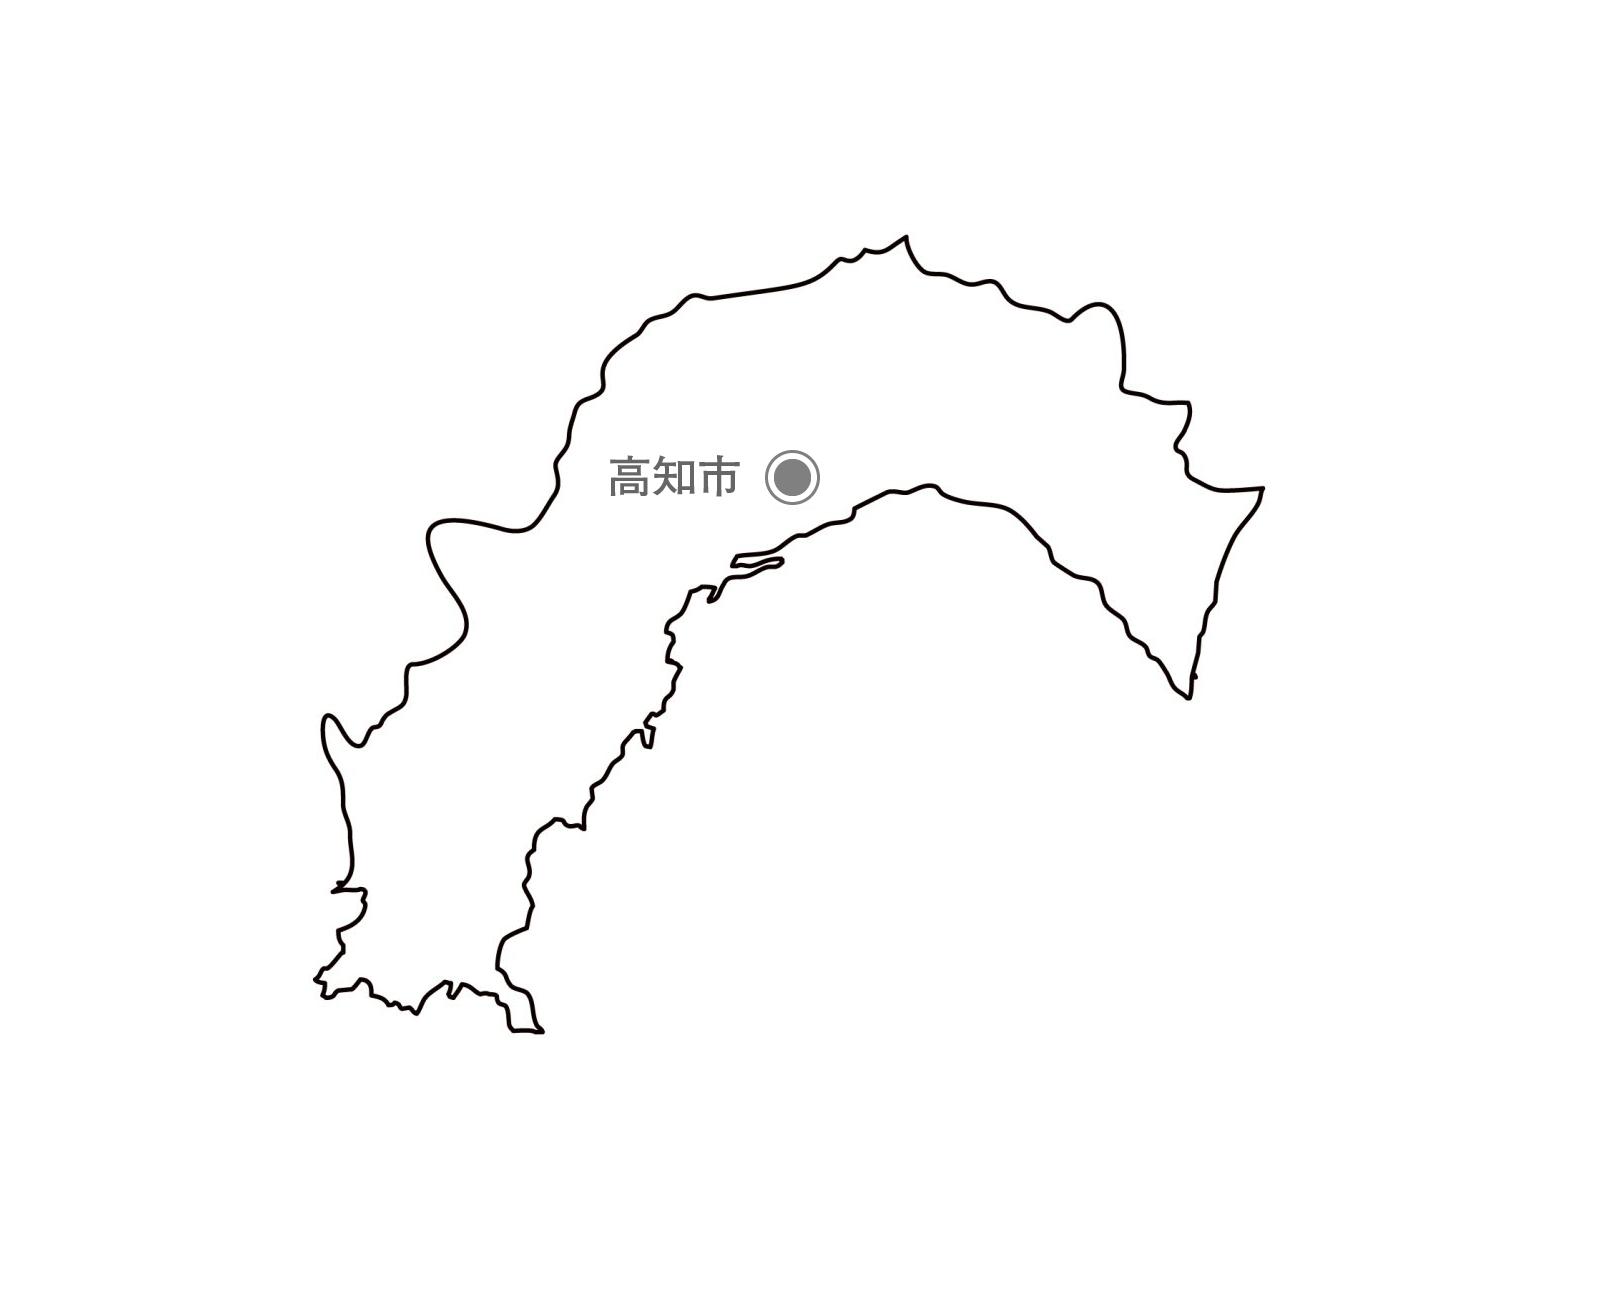 [白地図]高知県・都道府県名・県庁所在地あり